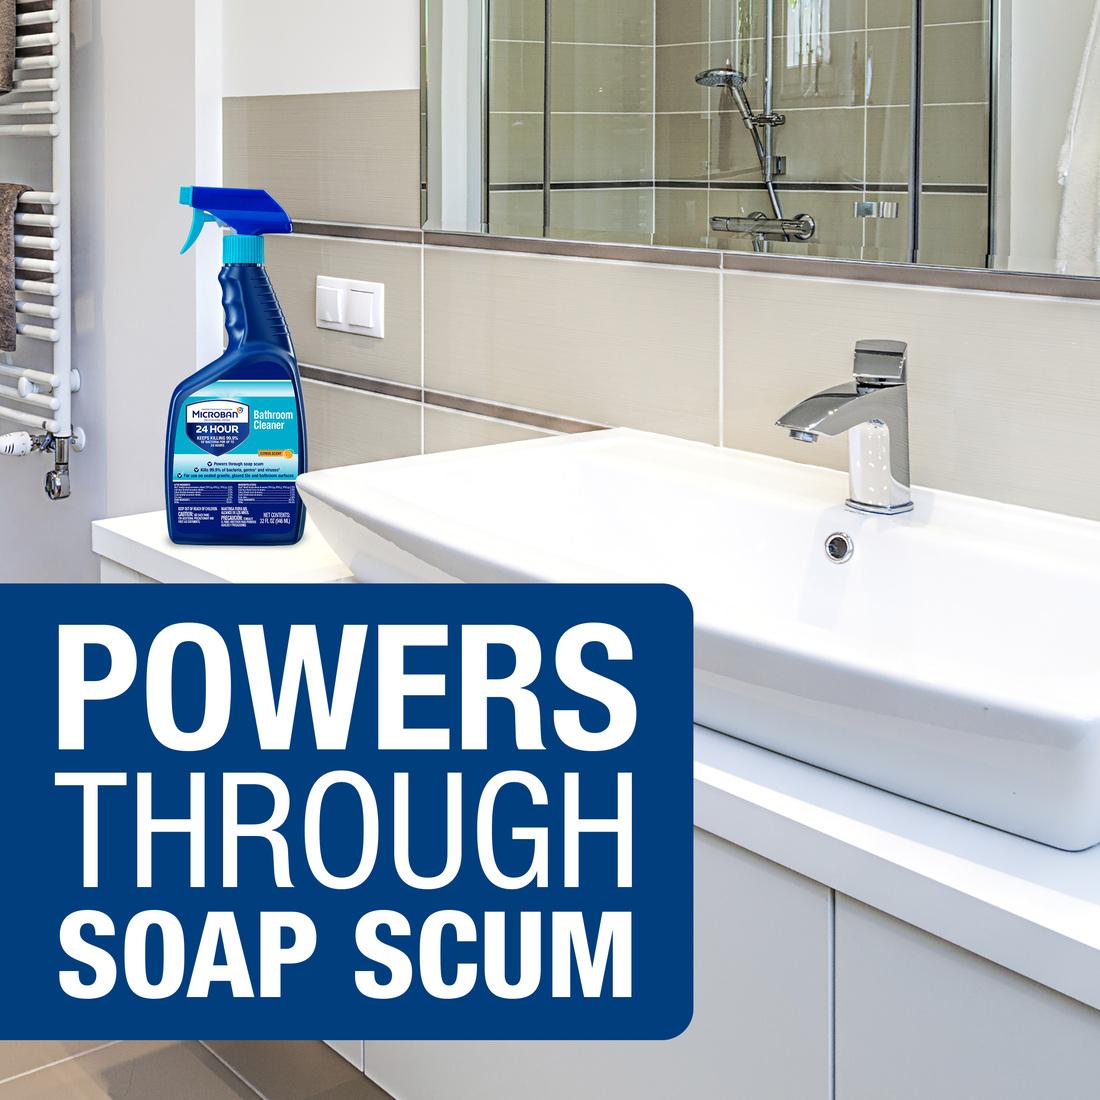 Microban Professional Bathroom Cleaner